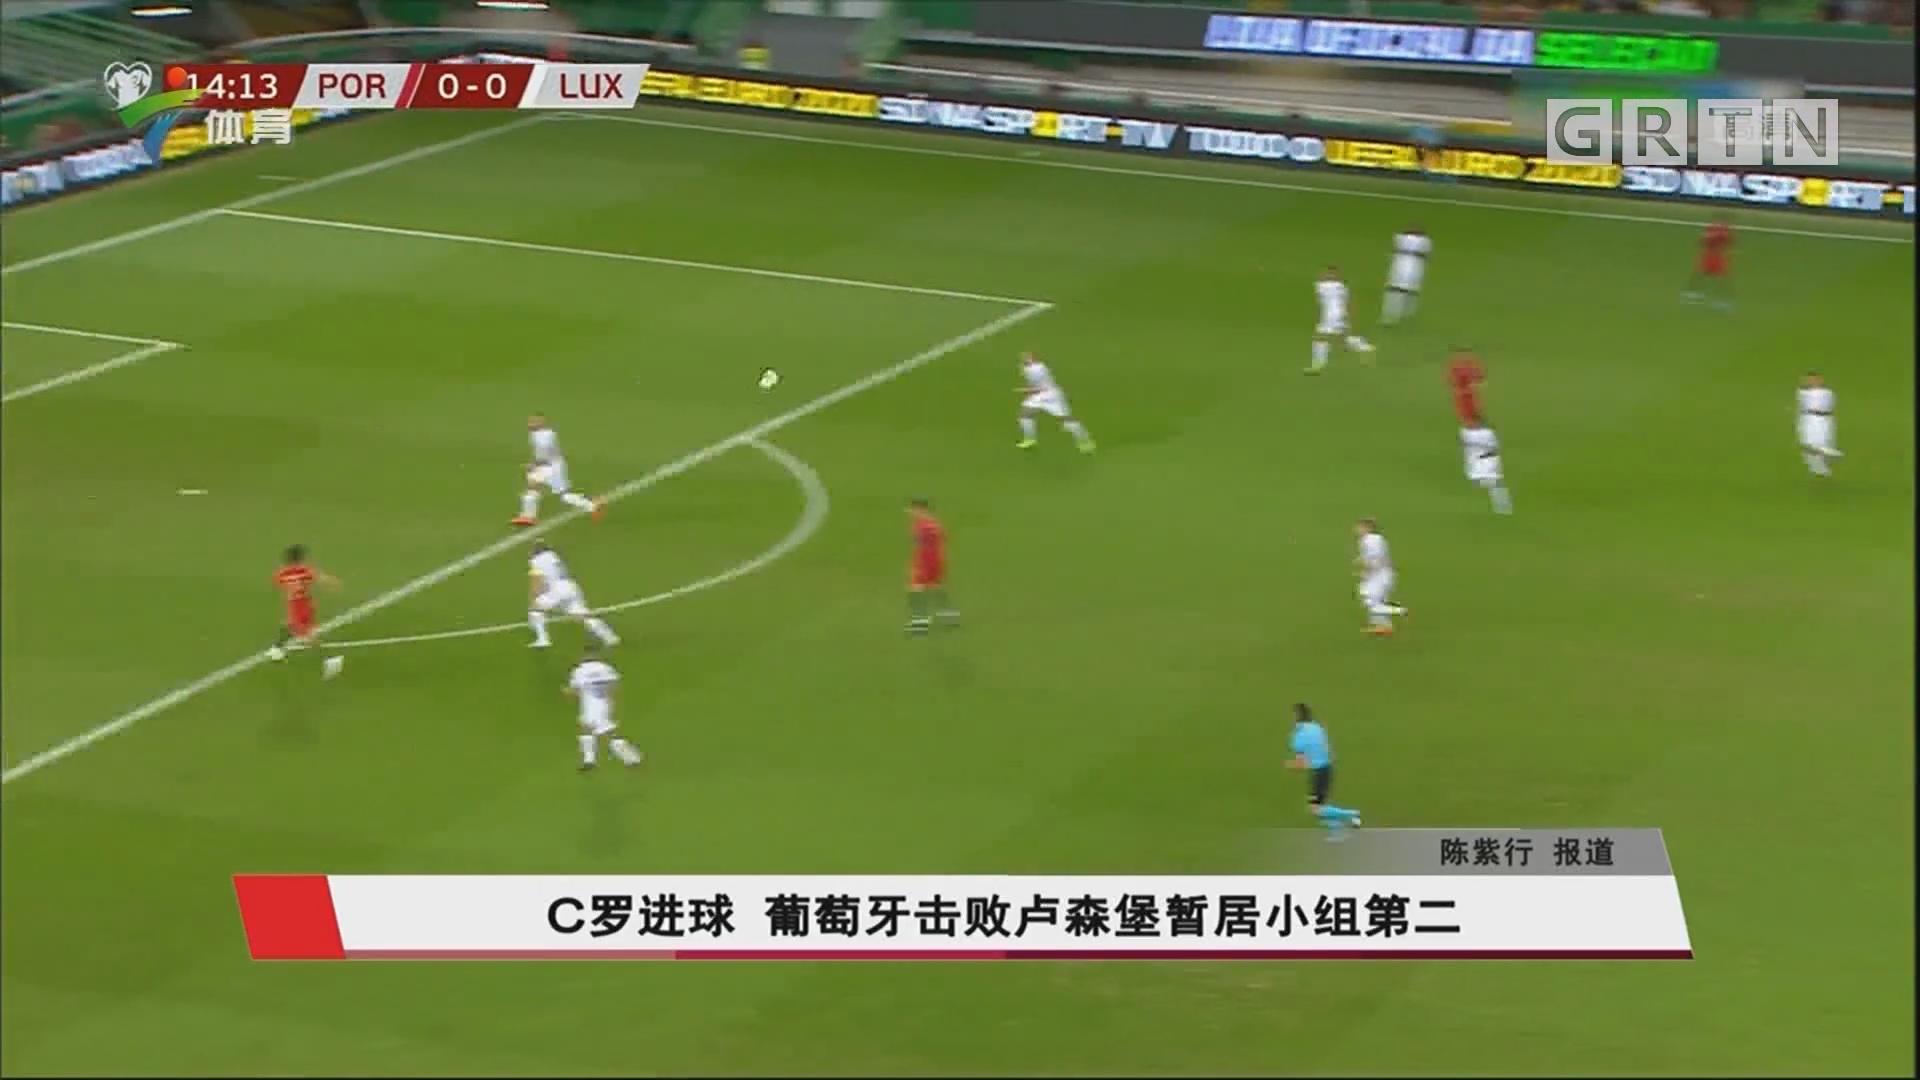 C罗进球 葡萄牙击败卢森堡暂居小组第二